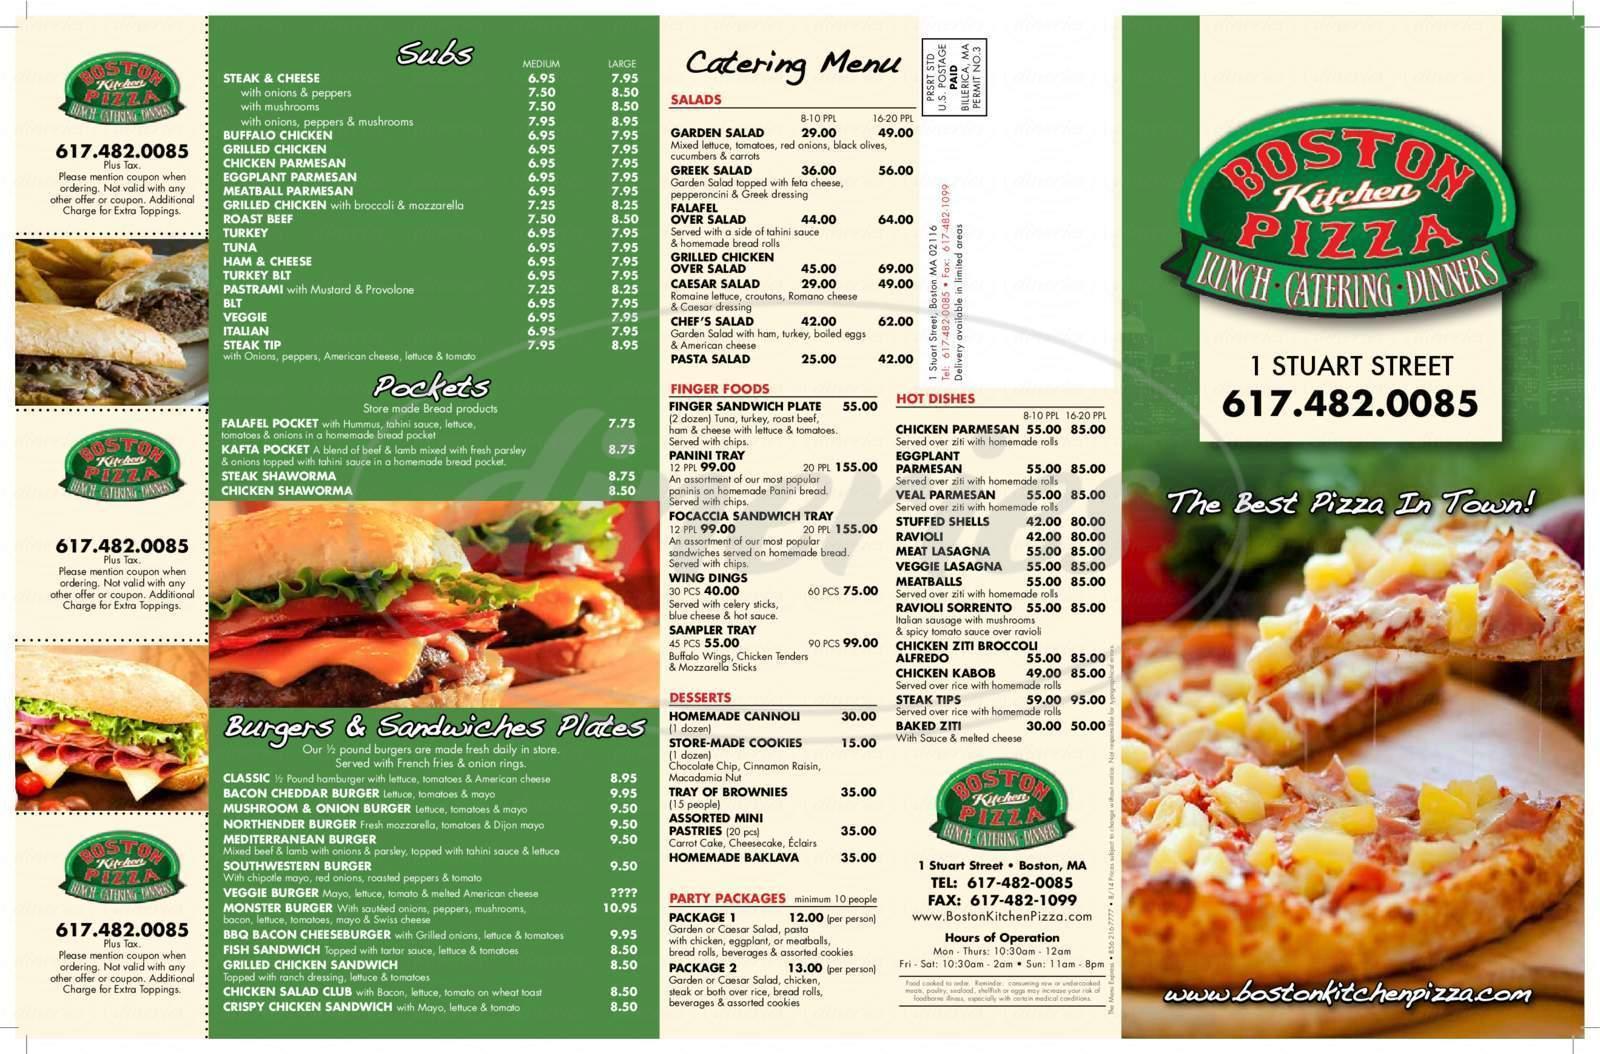 menu for Boston Kitchen Pizza